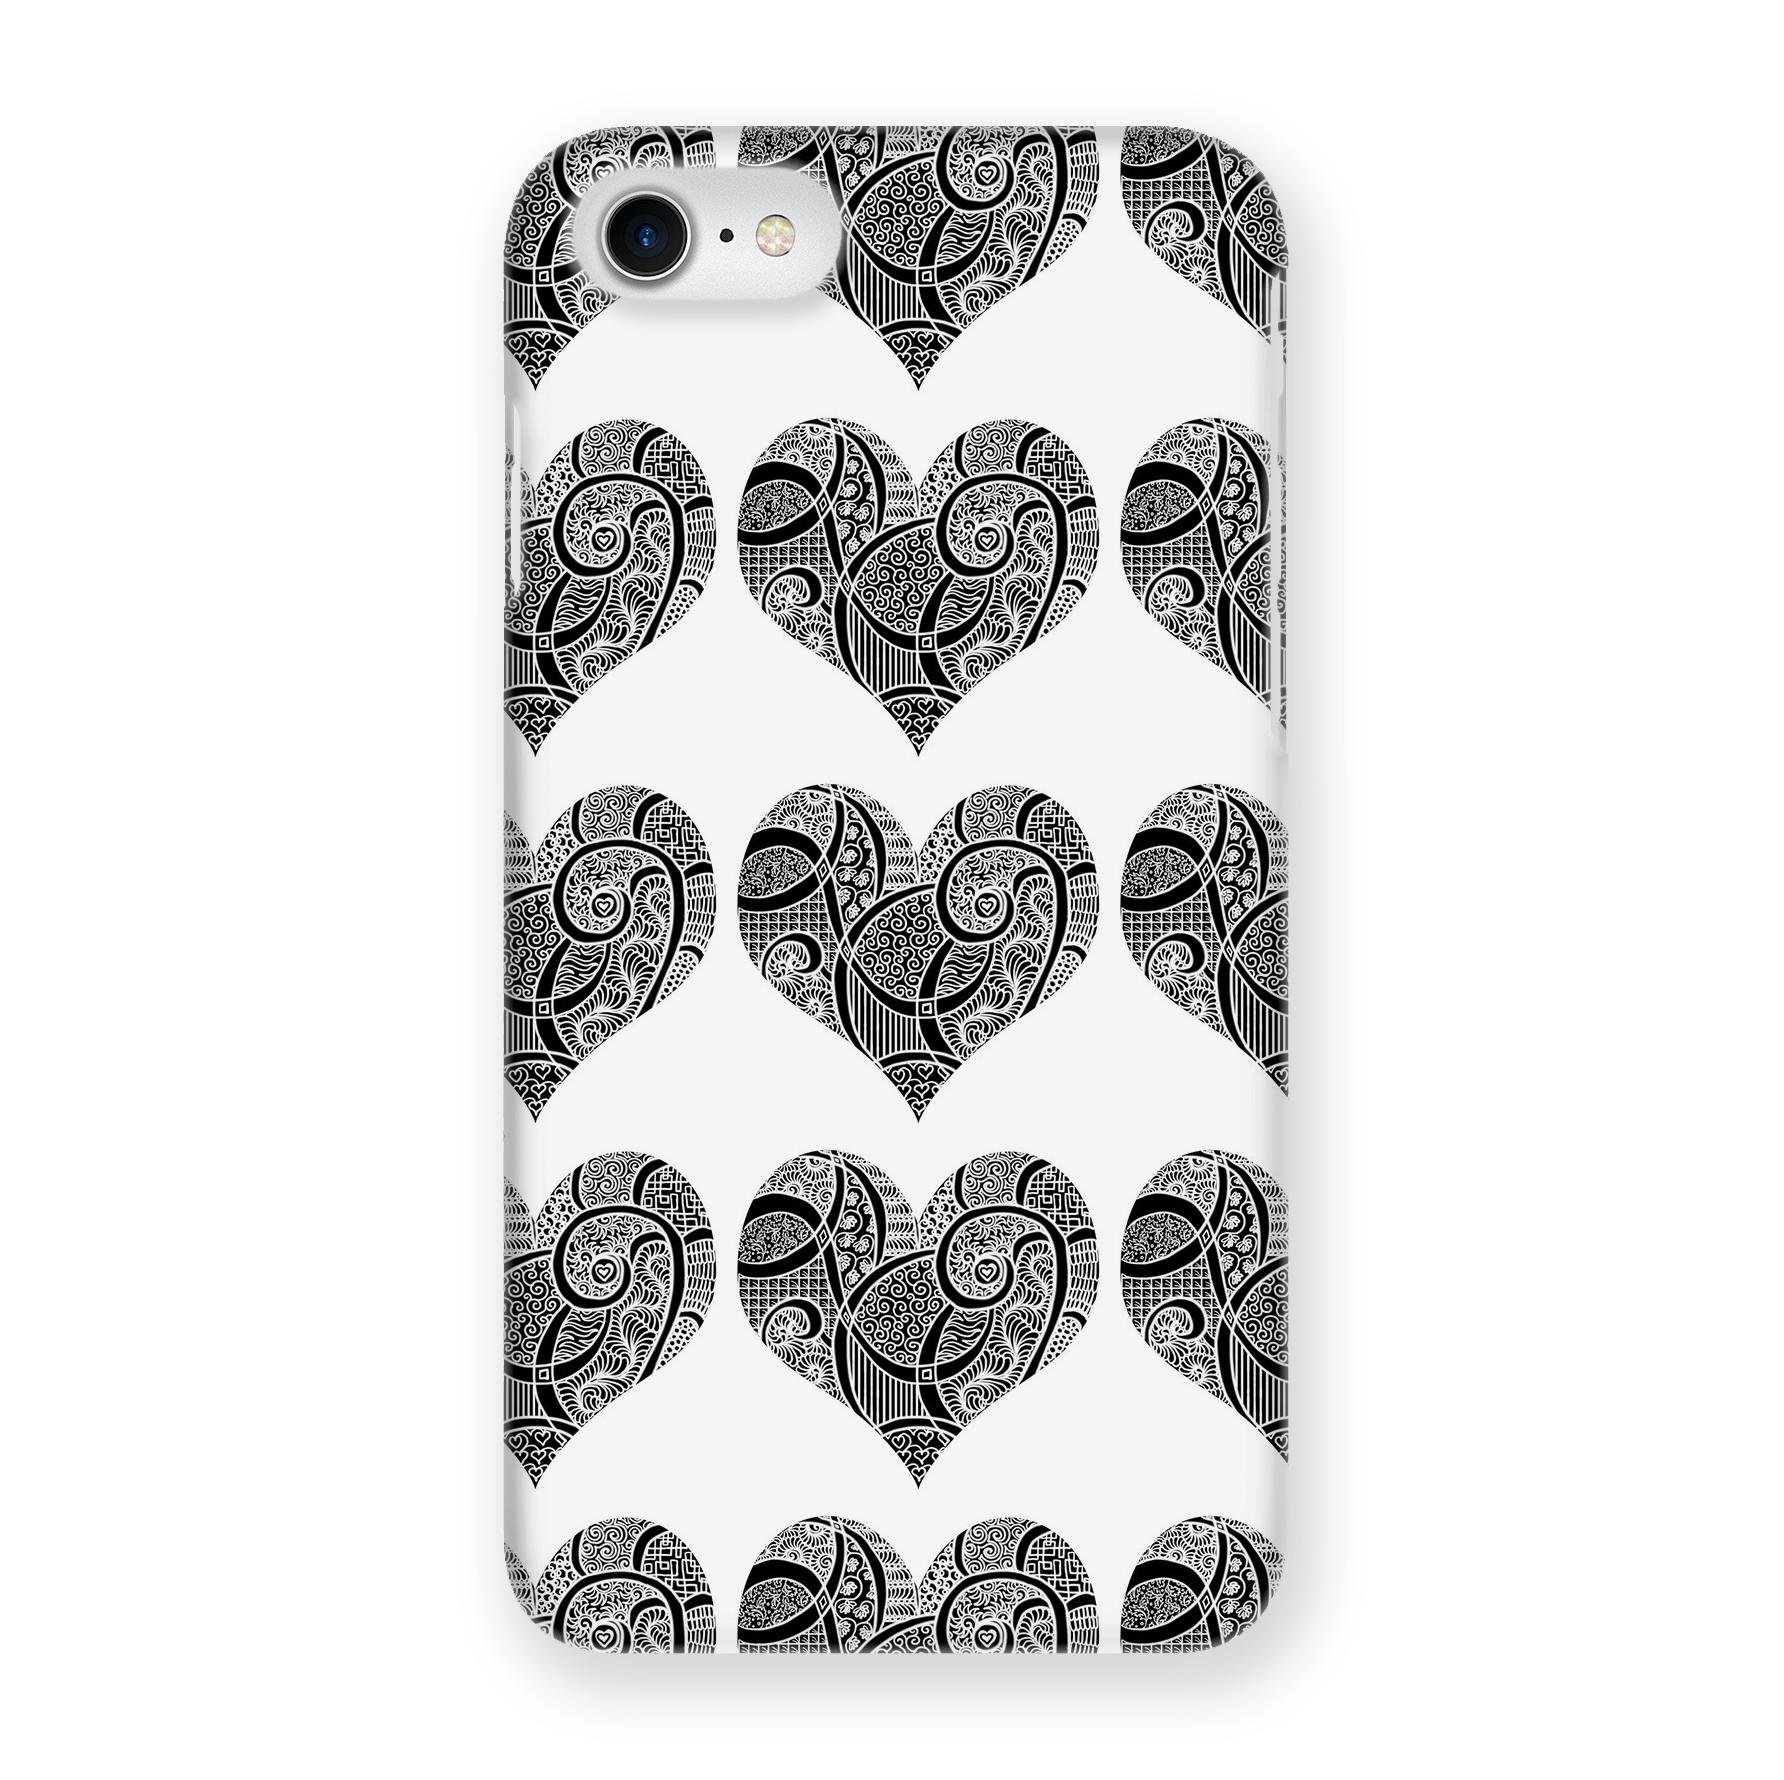 Чехол Mitya Veselkov Зентангл-сердца для Apple iPhone 7/8, IP7.MITYA-031, разноцветный чехол для iphone 5 mitya veselkov птички невелички